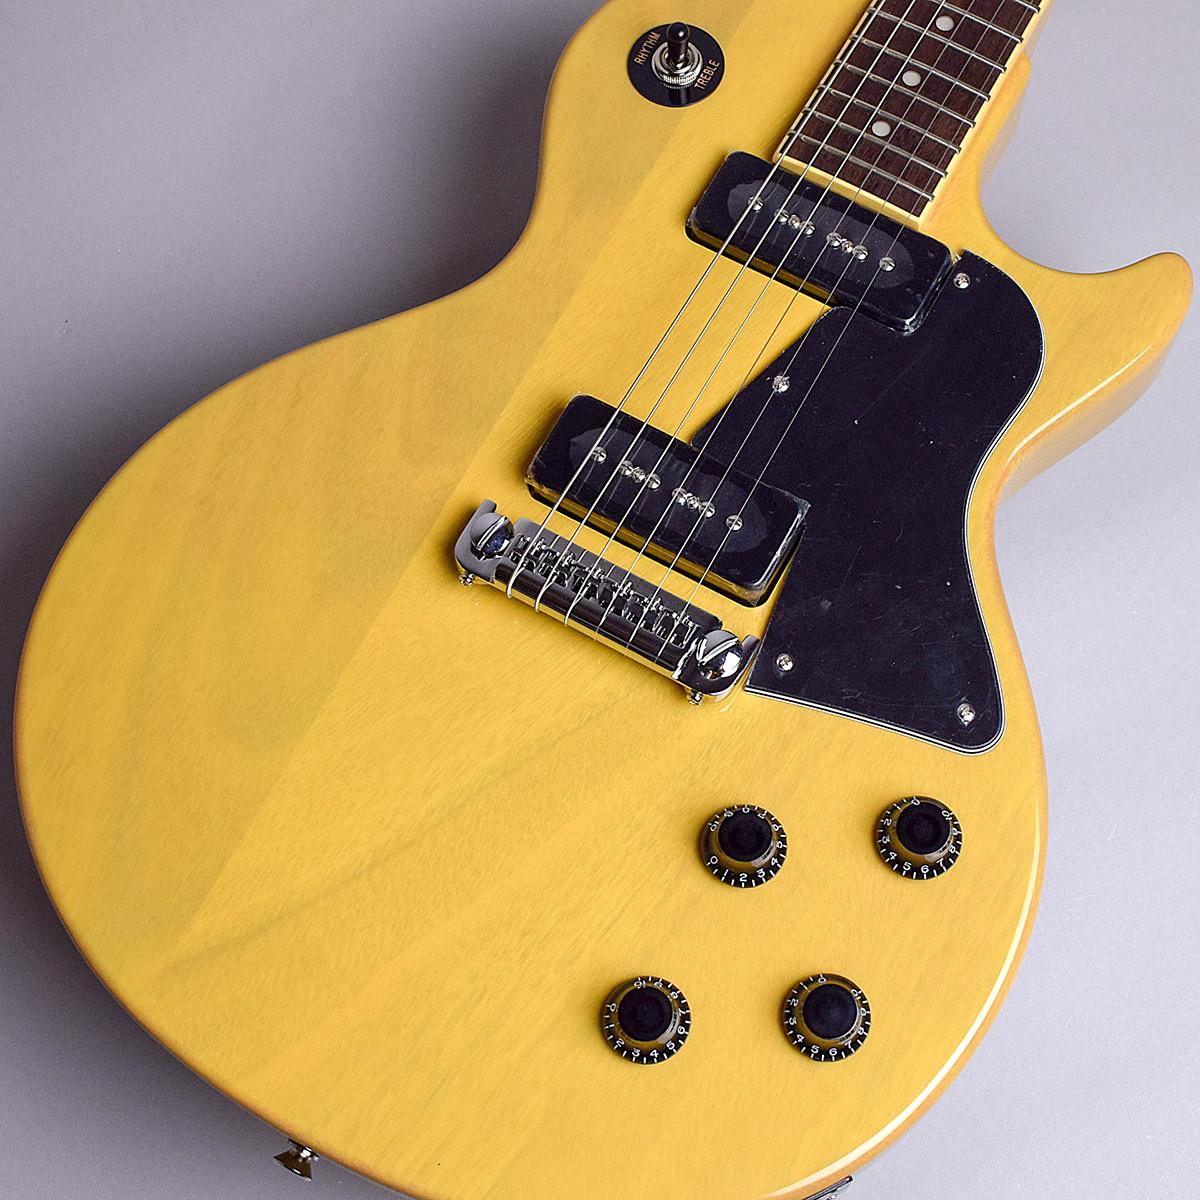 Burny SRLS TVY エレキギター レスポールスペシャルタイプ TV Yellow 【バーニー】【新品特価】